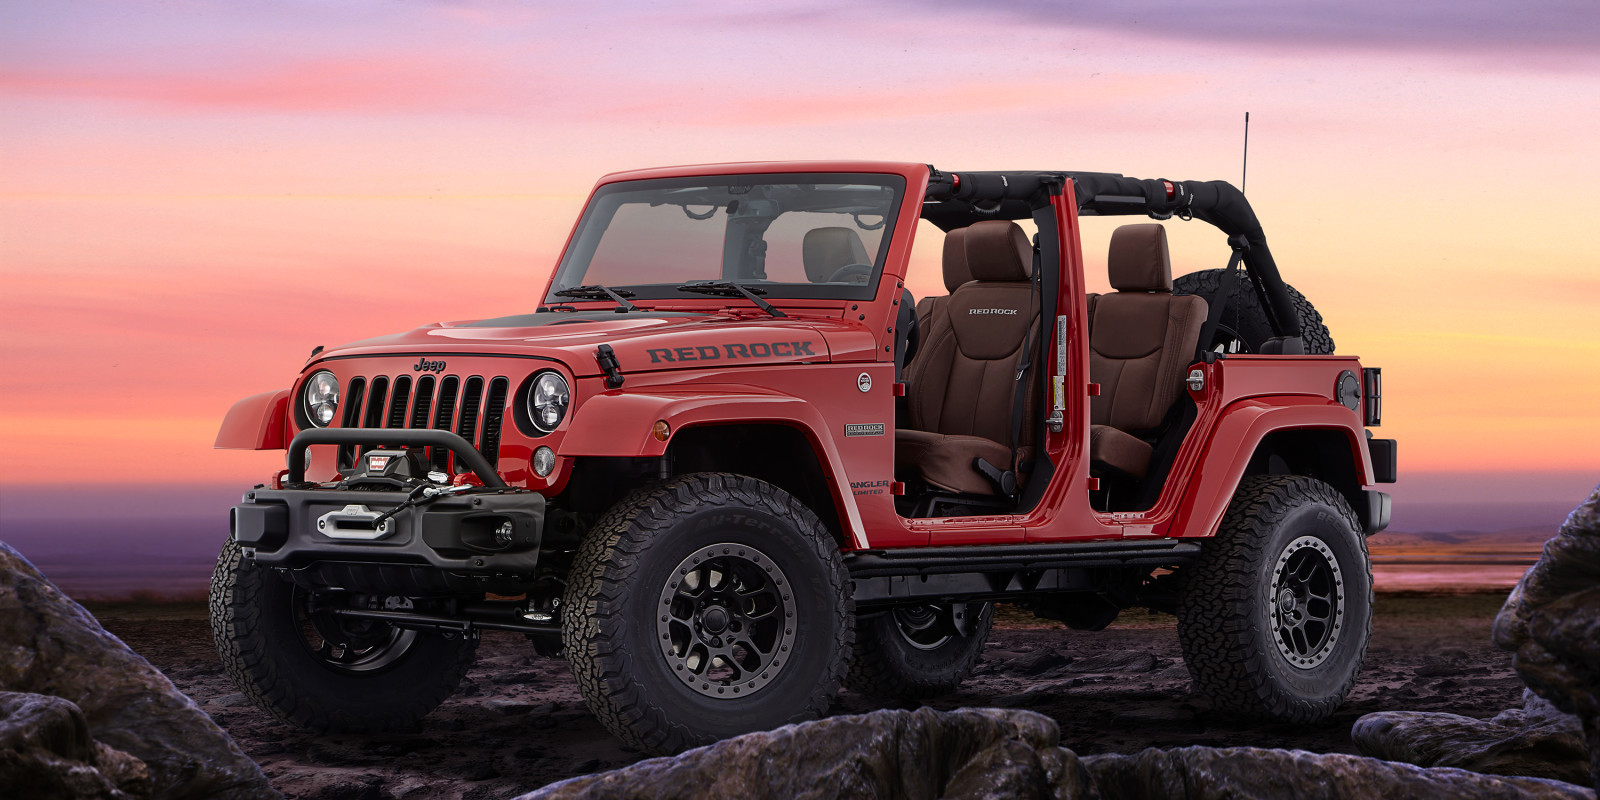 MOPAR Reveals Jeep Wrangler Red Rock Concept At SEMA